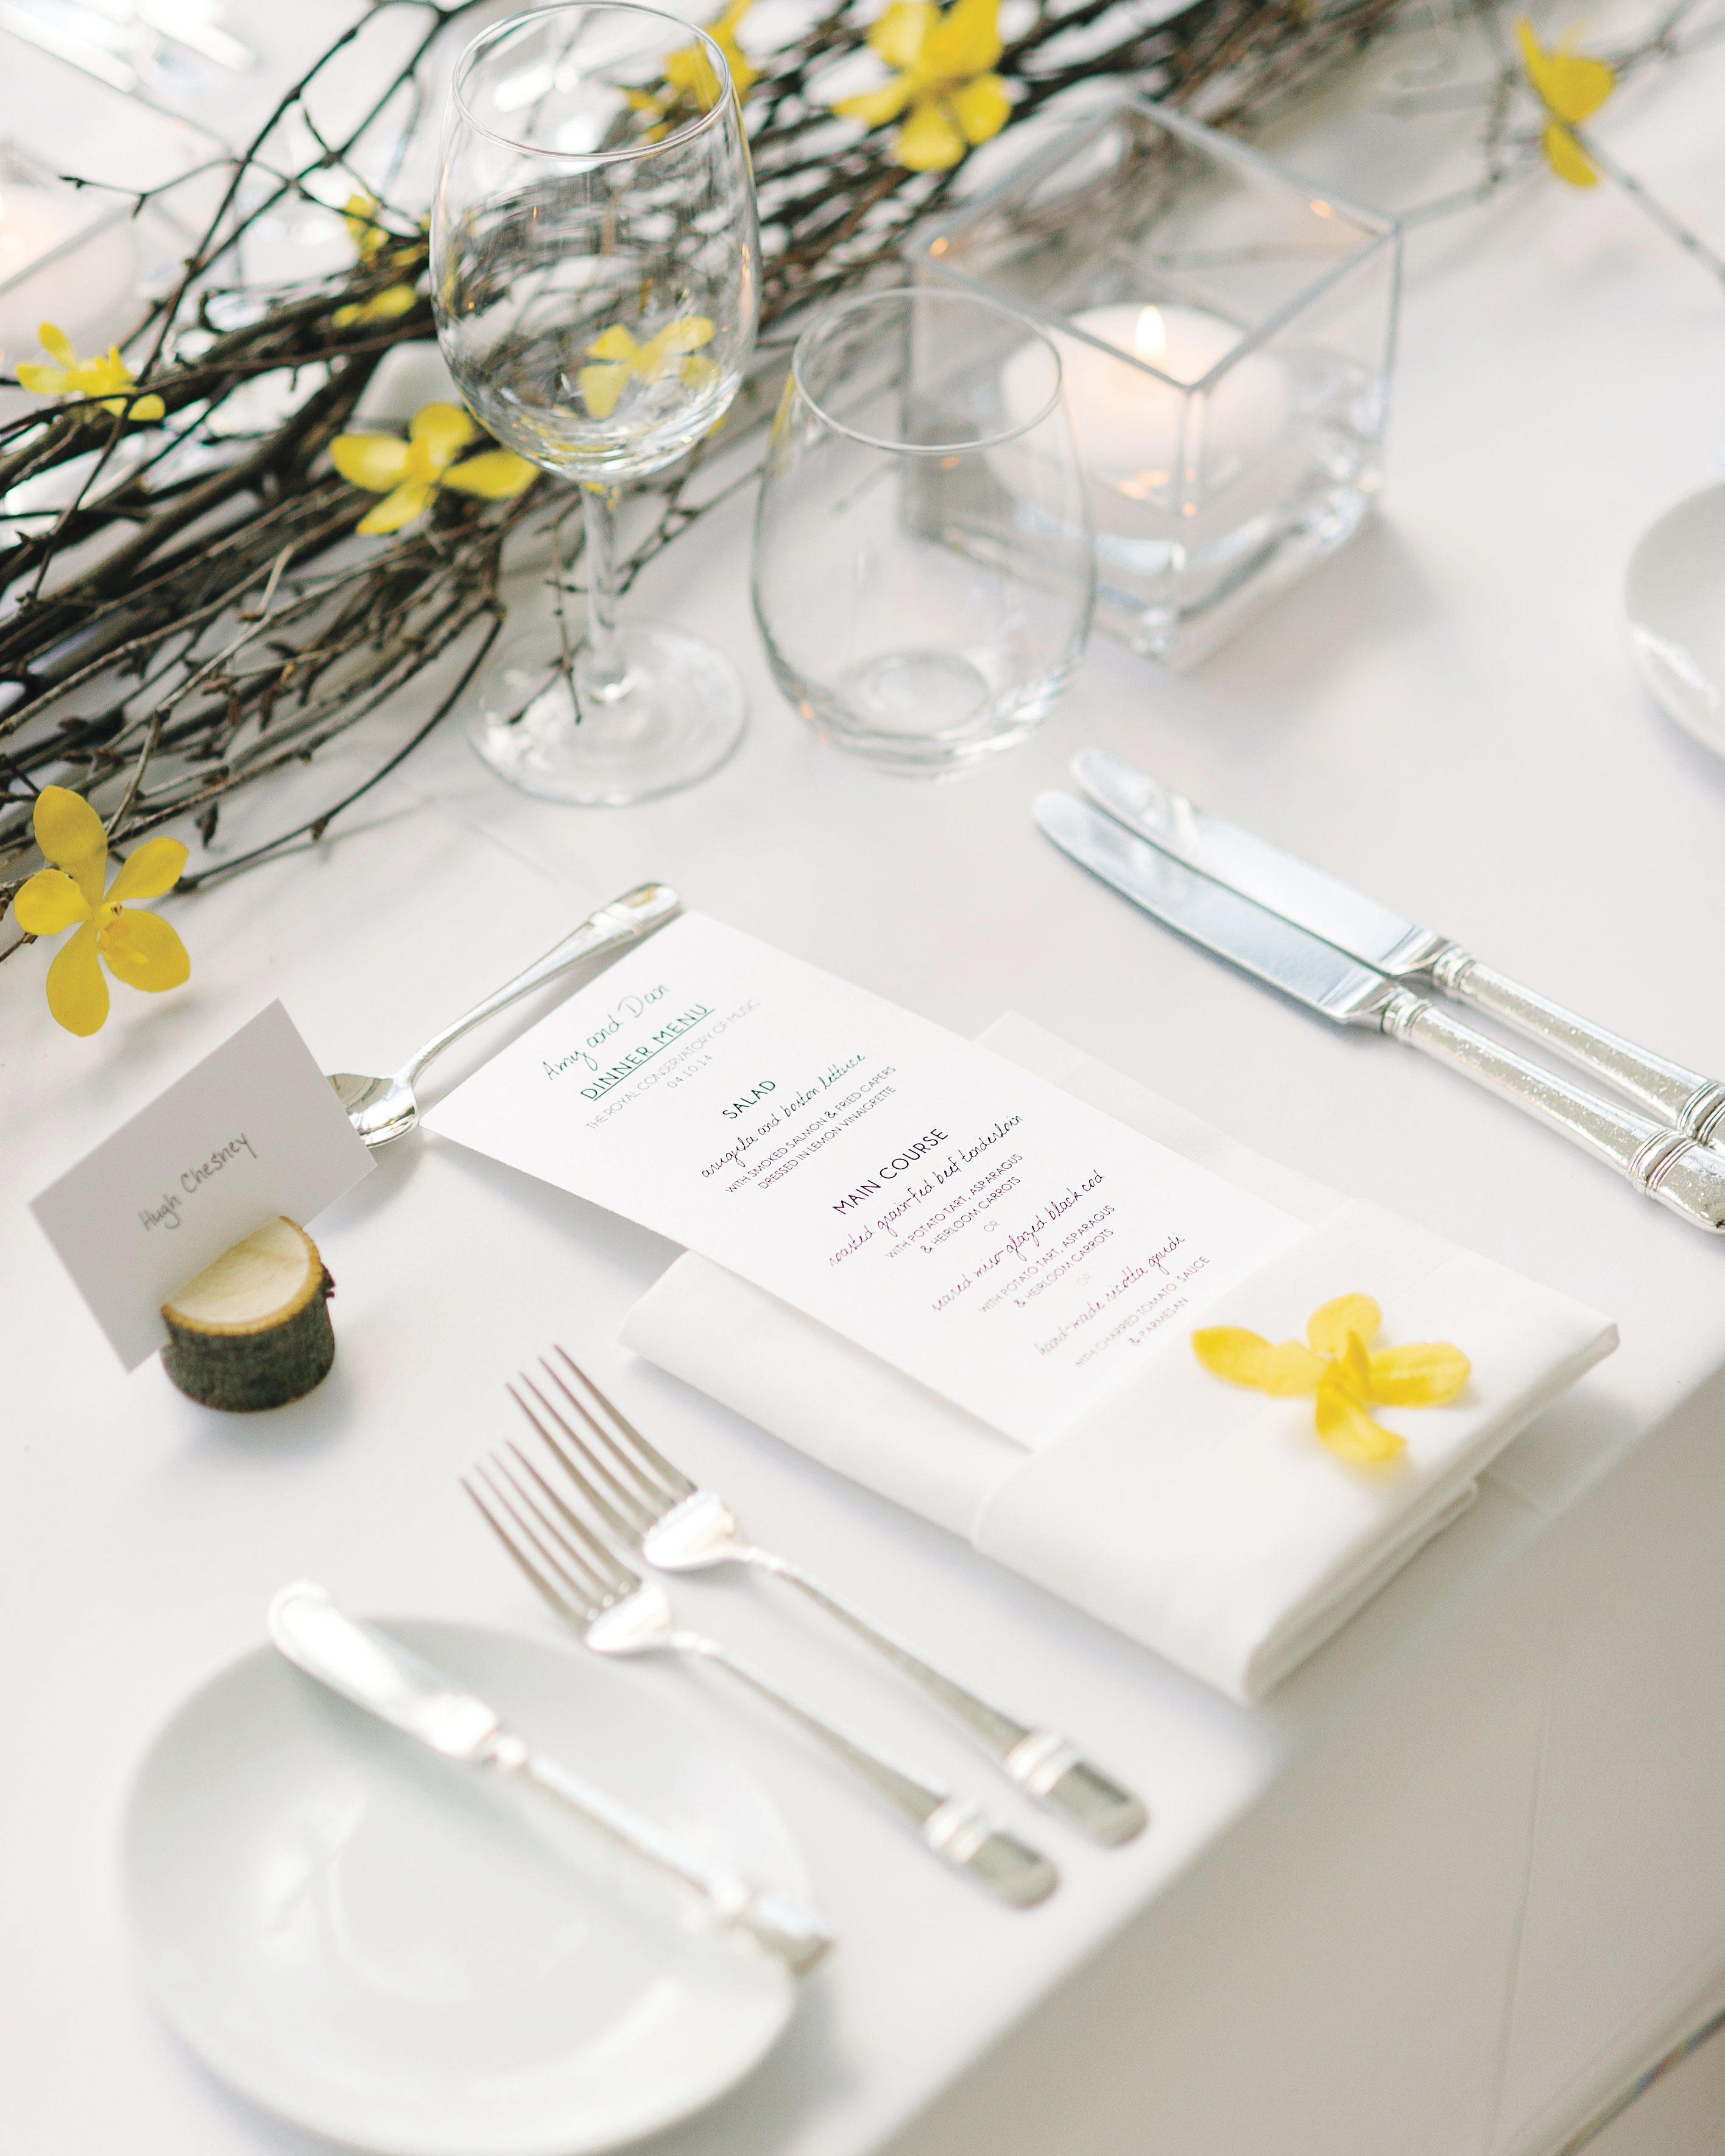 mamy-dan-wedding-canada-details-table-settings-036-s112629.jpg